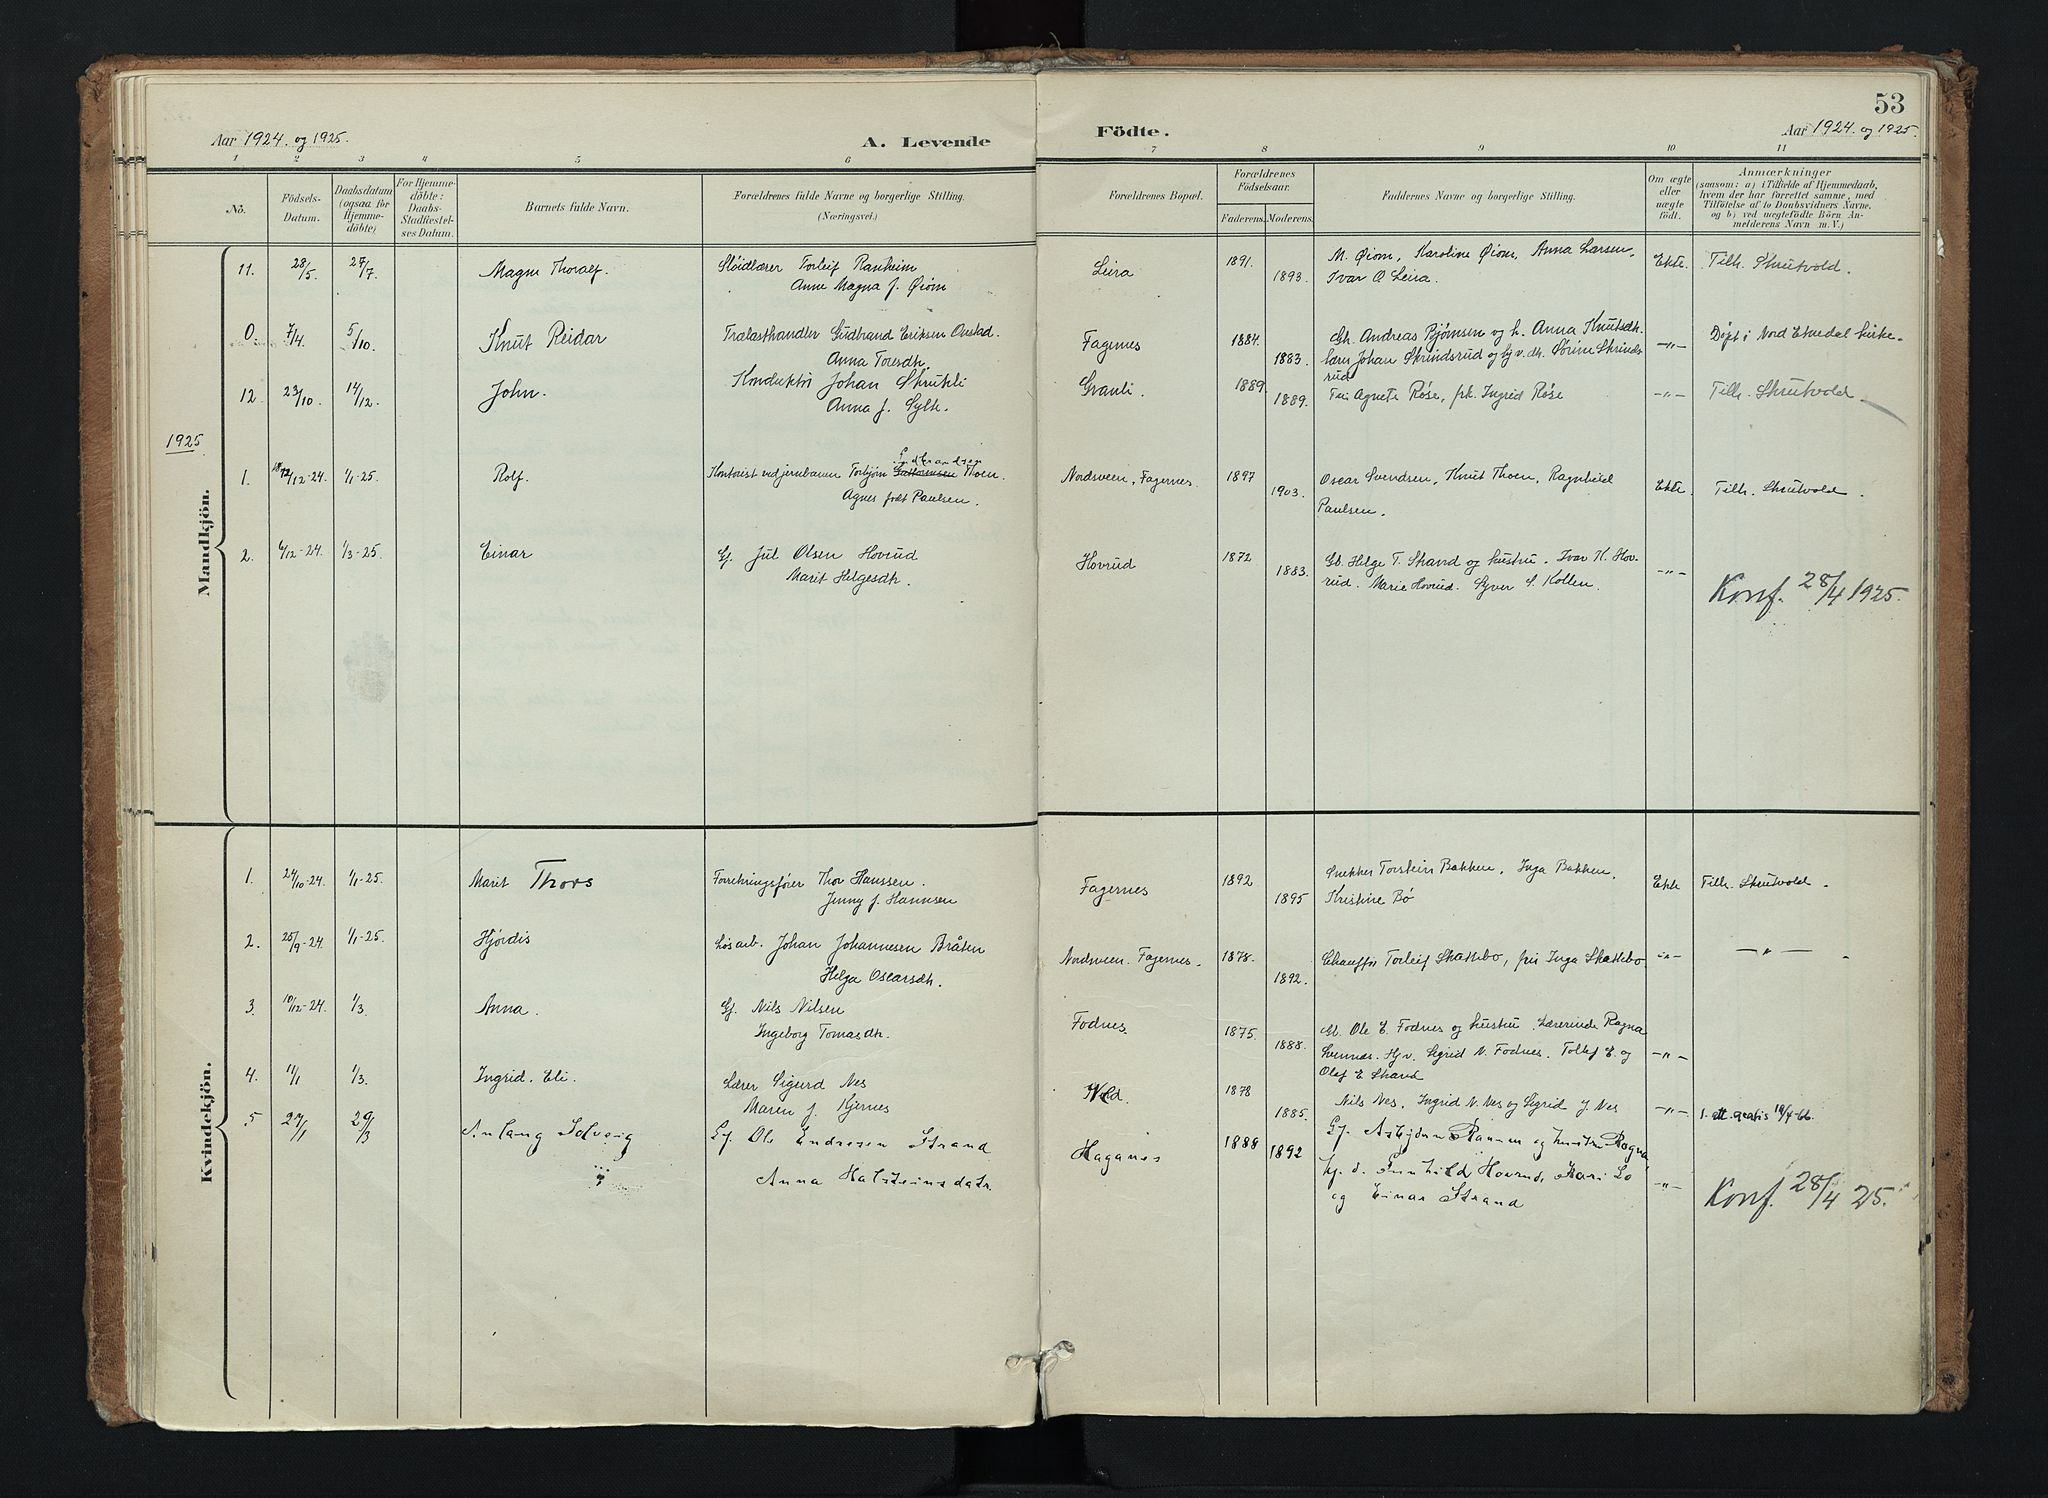 SAH, Nord-Aurdal prestekontor, Ministerialbok nr. 16, 1897-1925, s. 53